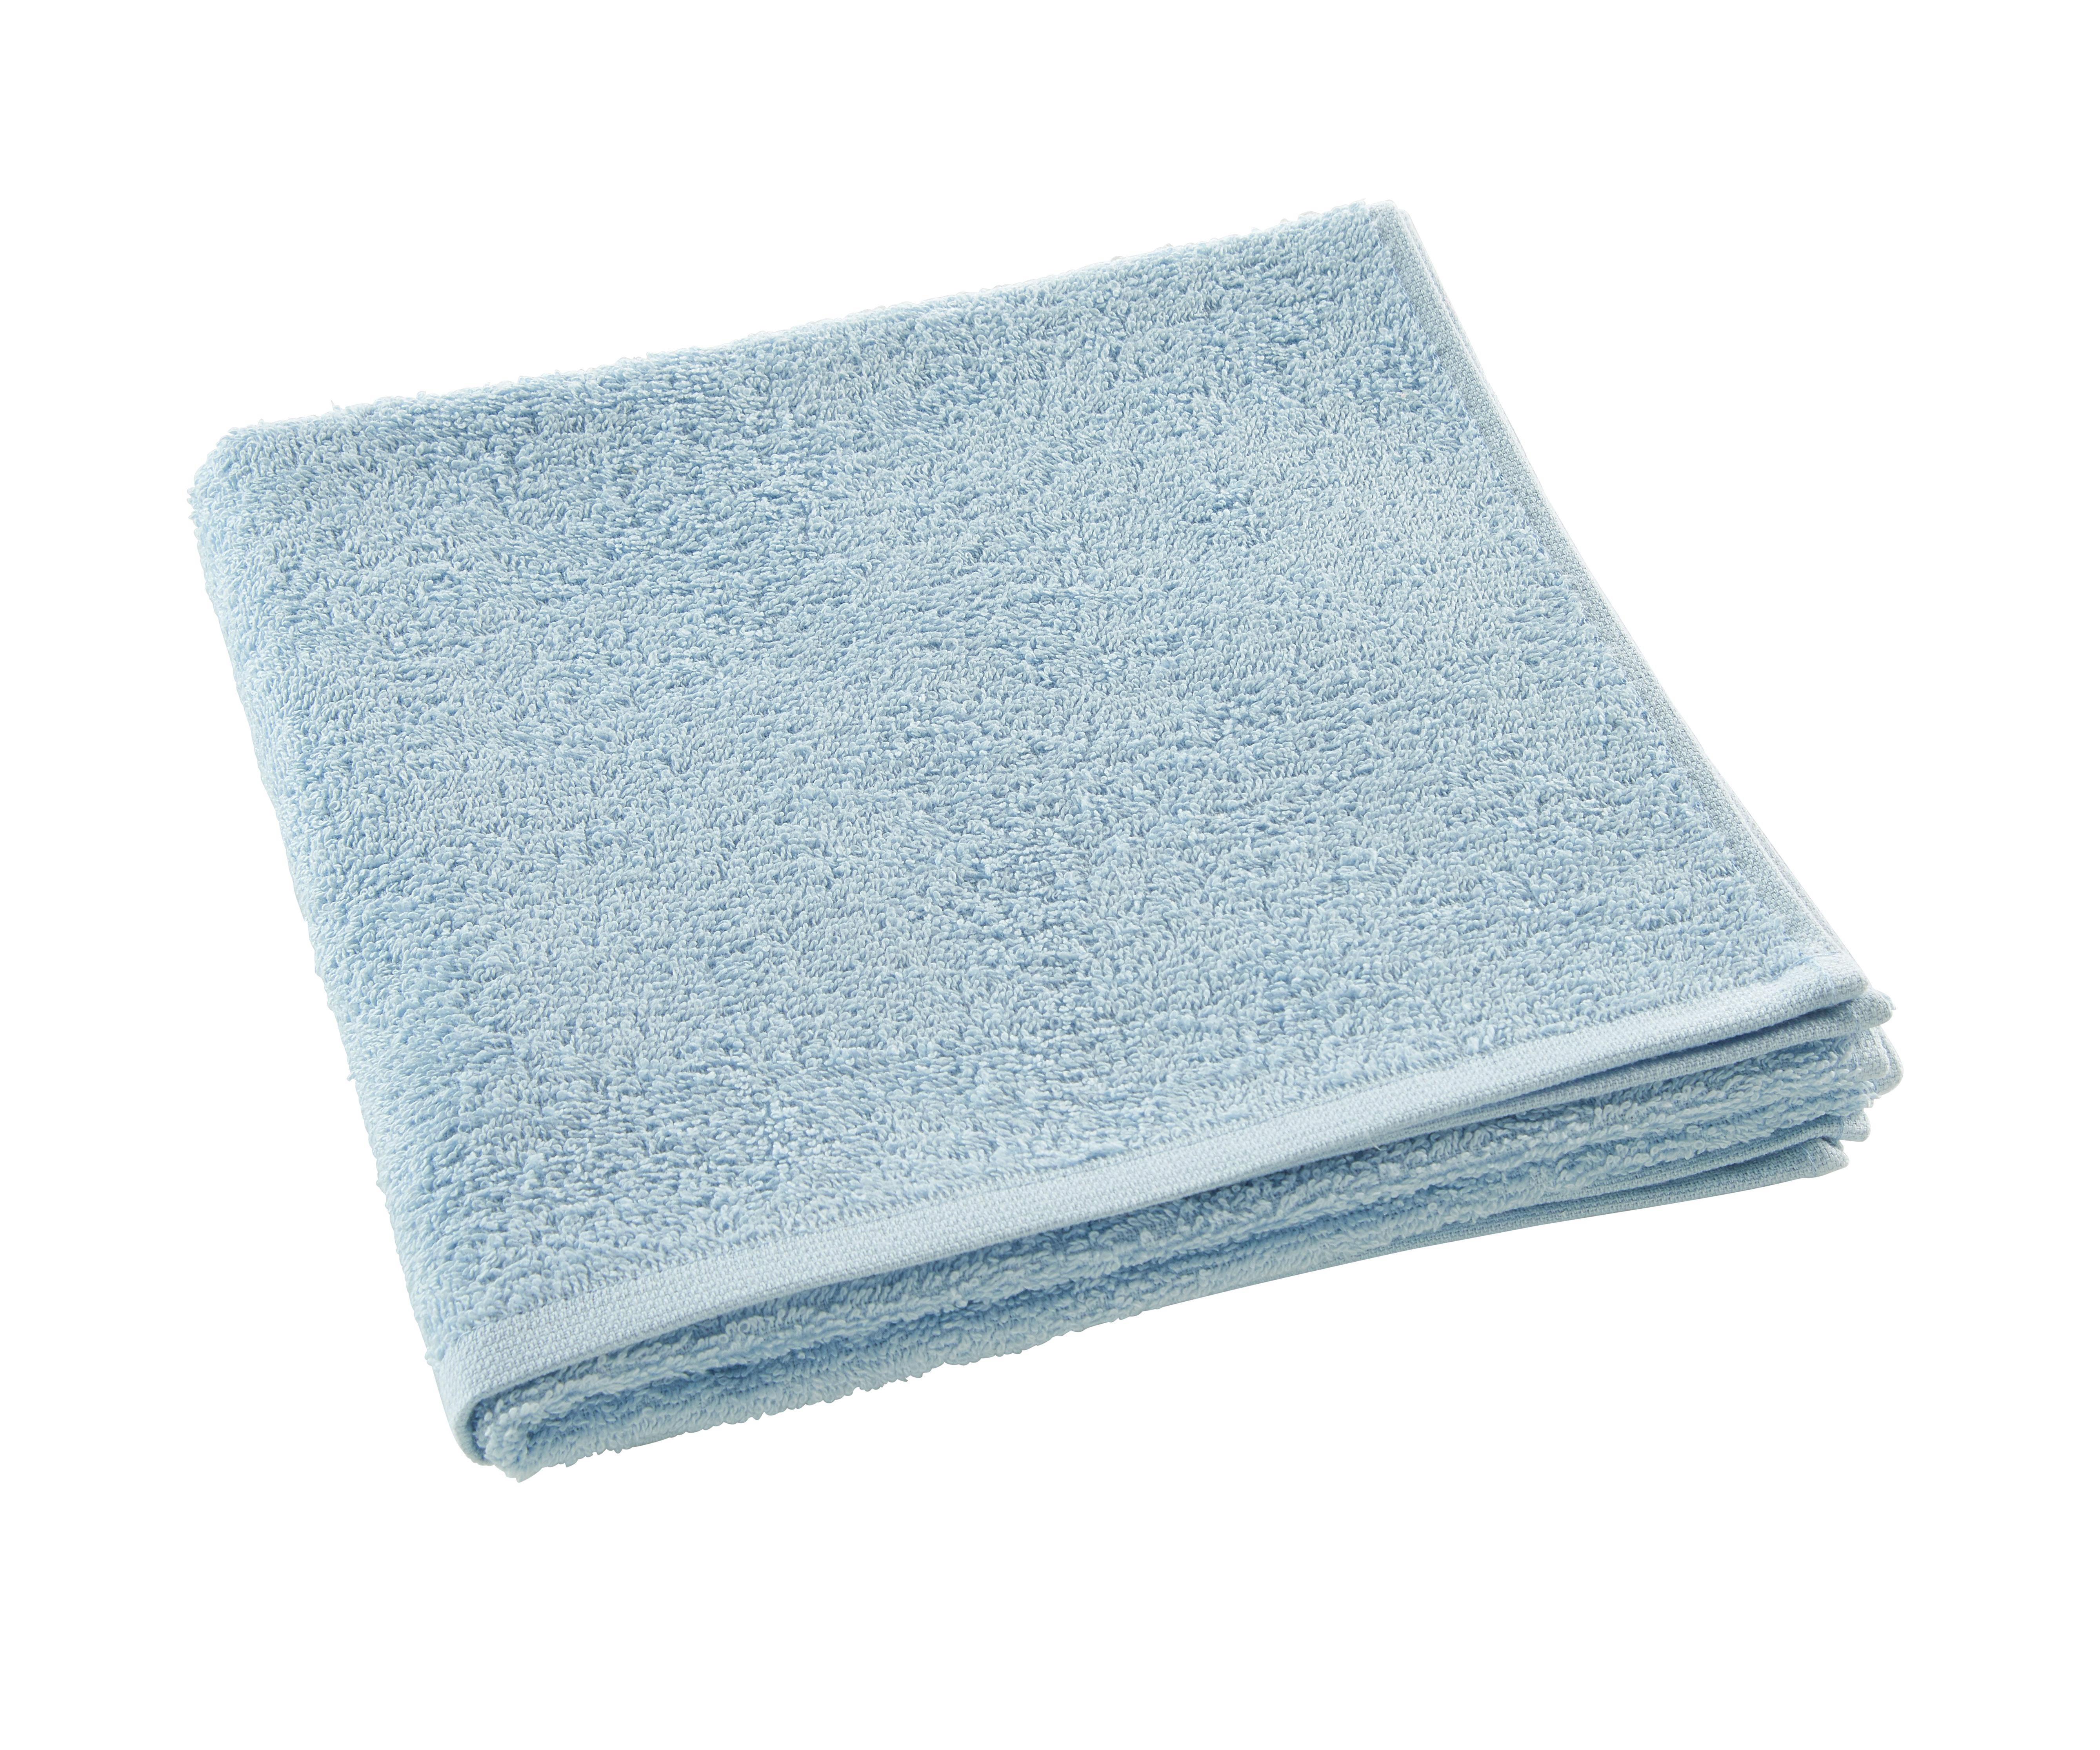 BRISAČA DENISE, 50/100 - svetlo modra, Basics, tekstil (50/100cm) - BOXXX